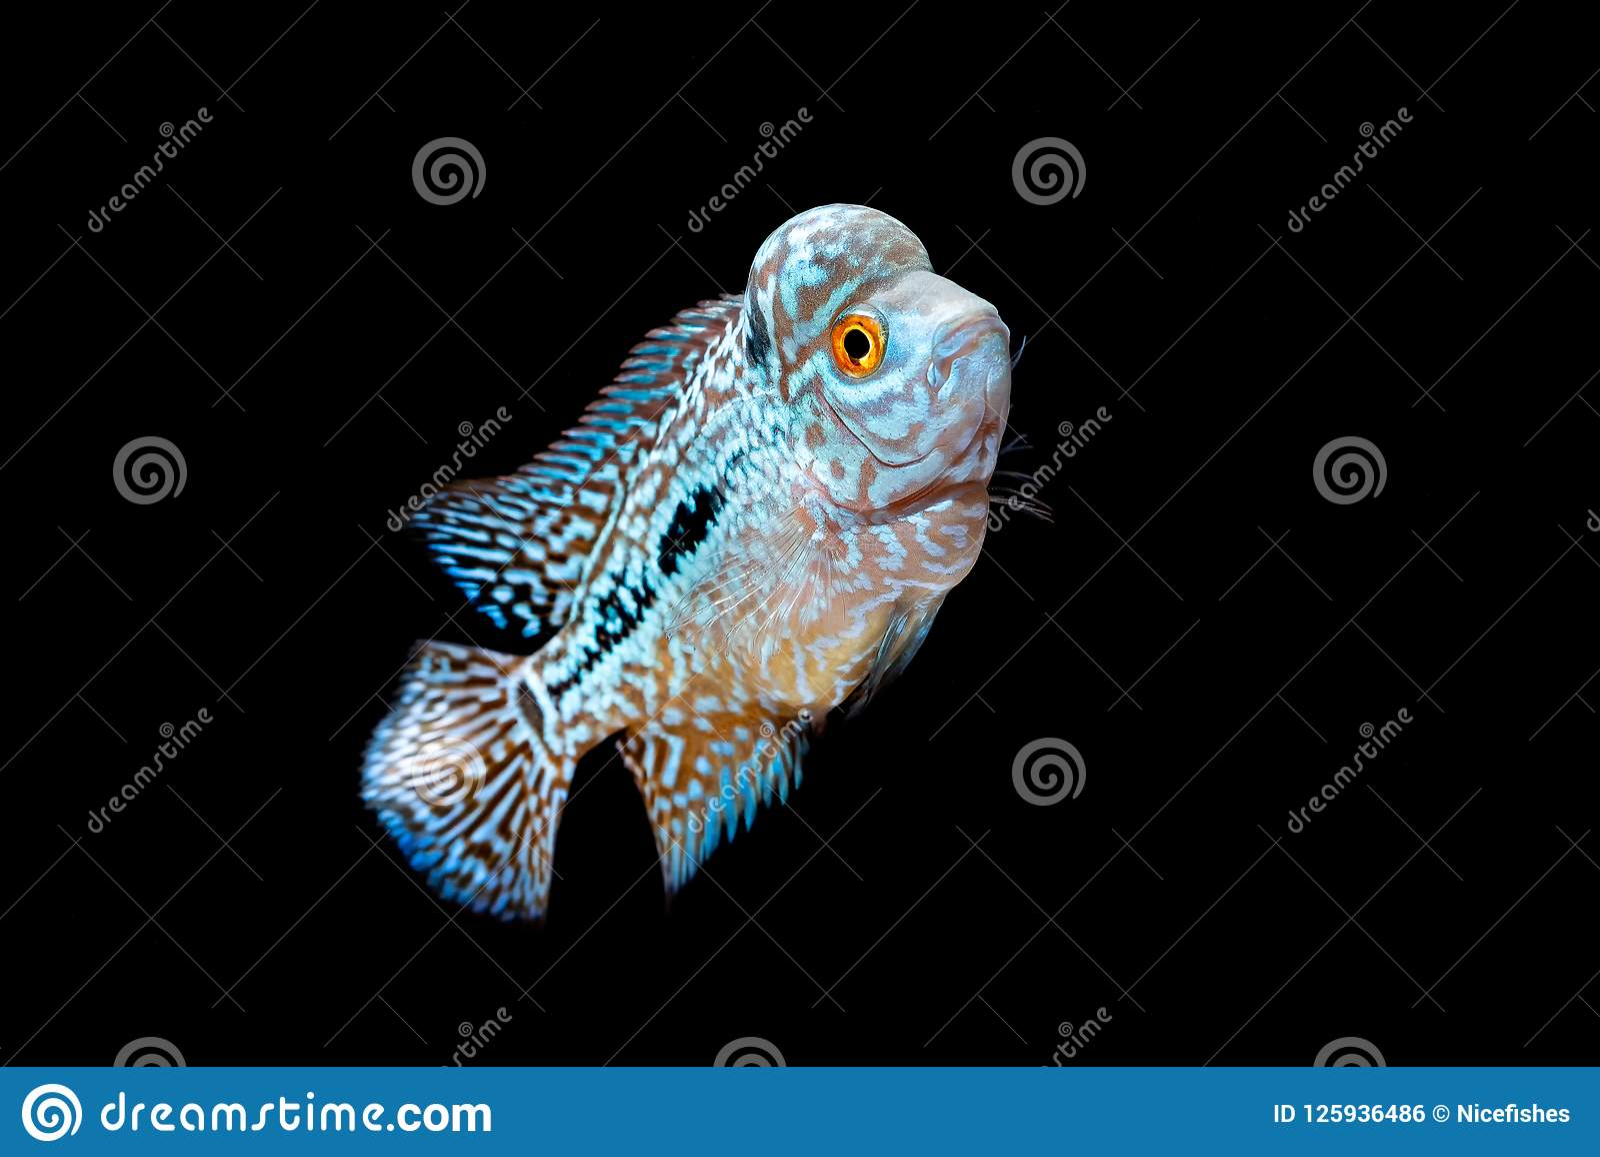 Cichlids Kingkamfa In The Aquarium Stock Photo Image Of Funny